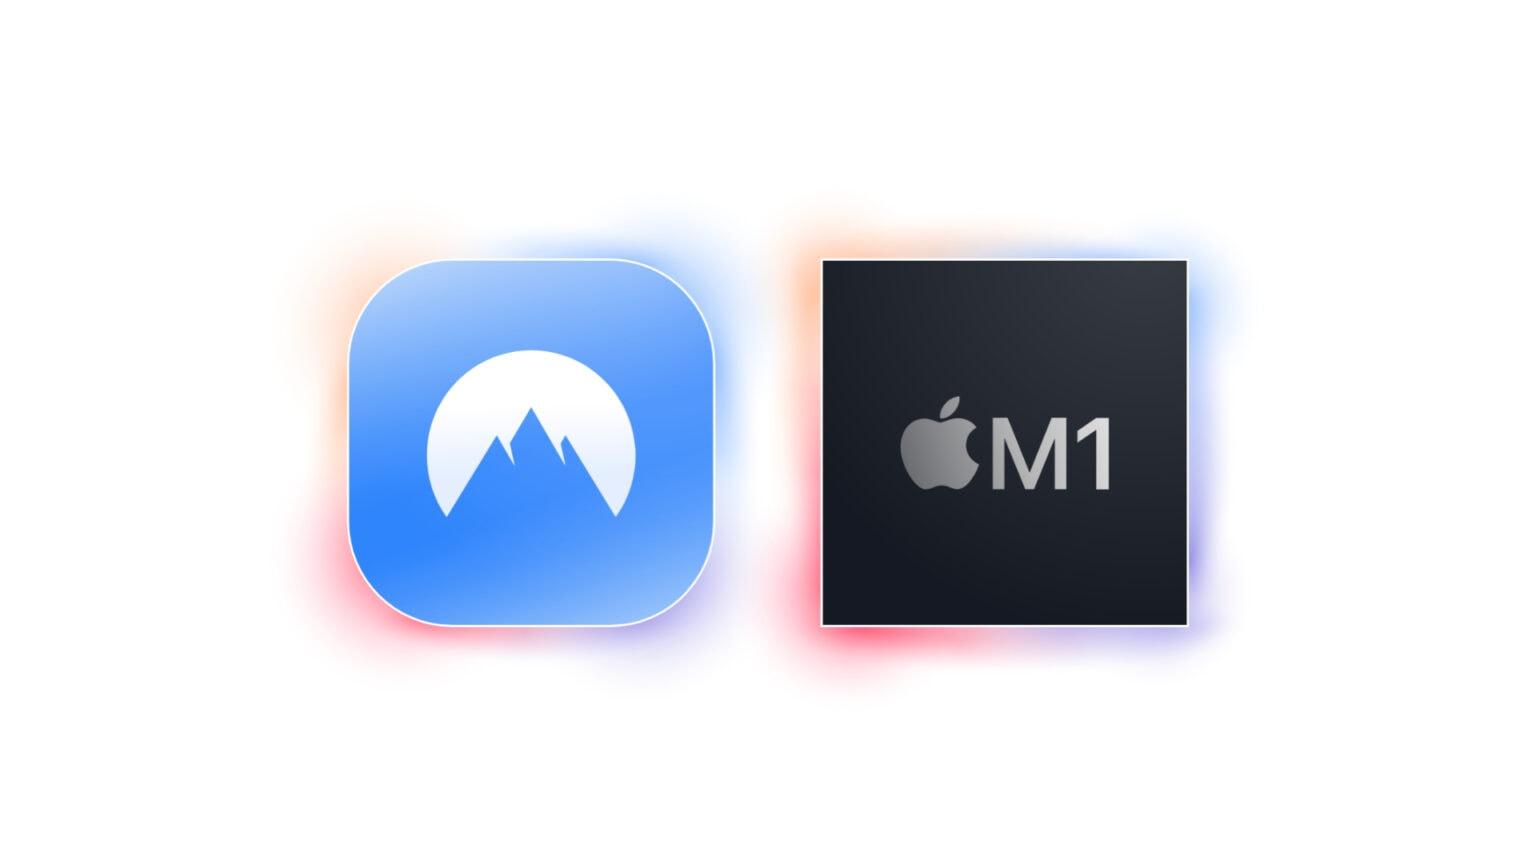 NordVPN now optimized for M1 Macs